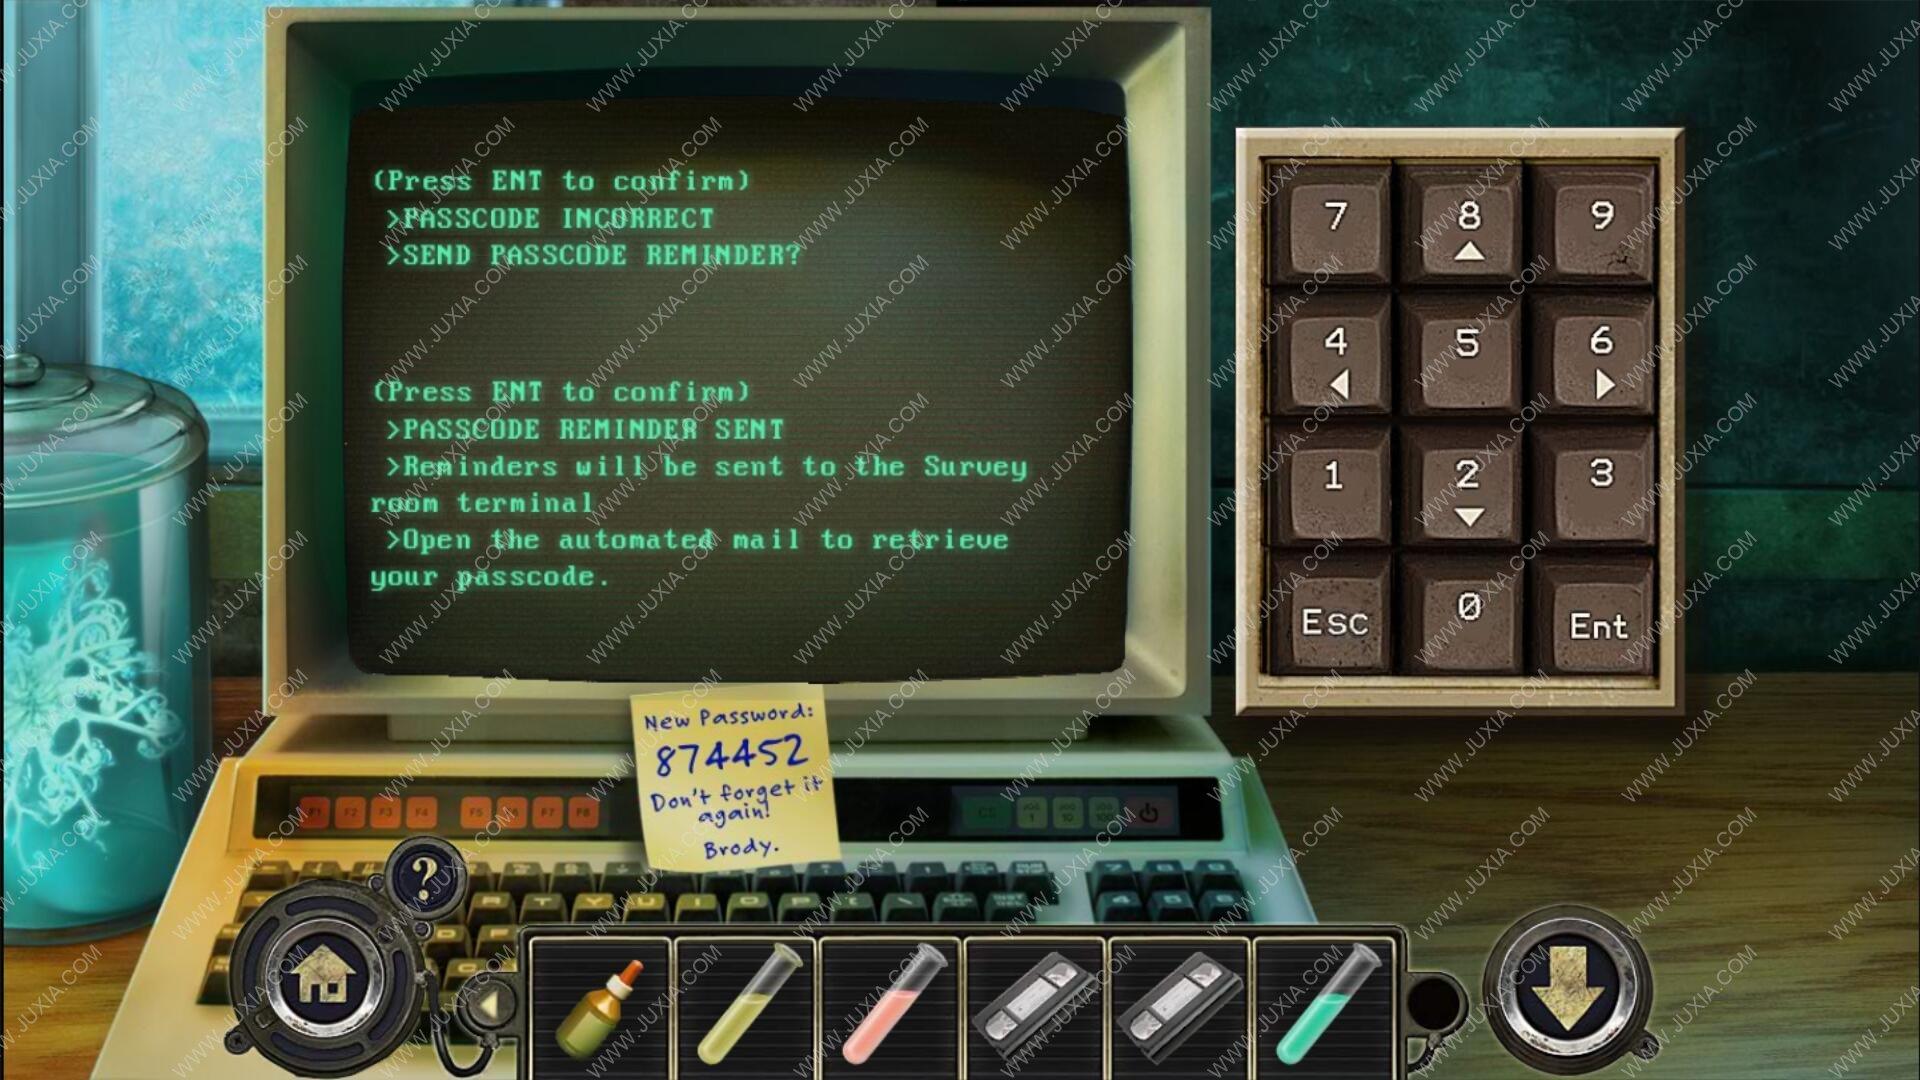 Facility47攻略第五关图文 47号房间攻略第5关电脑密码怎么获得